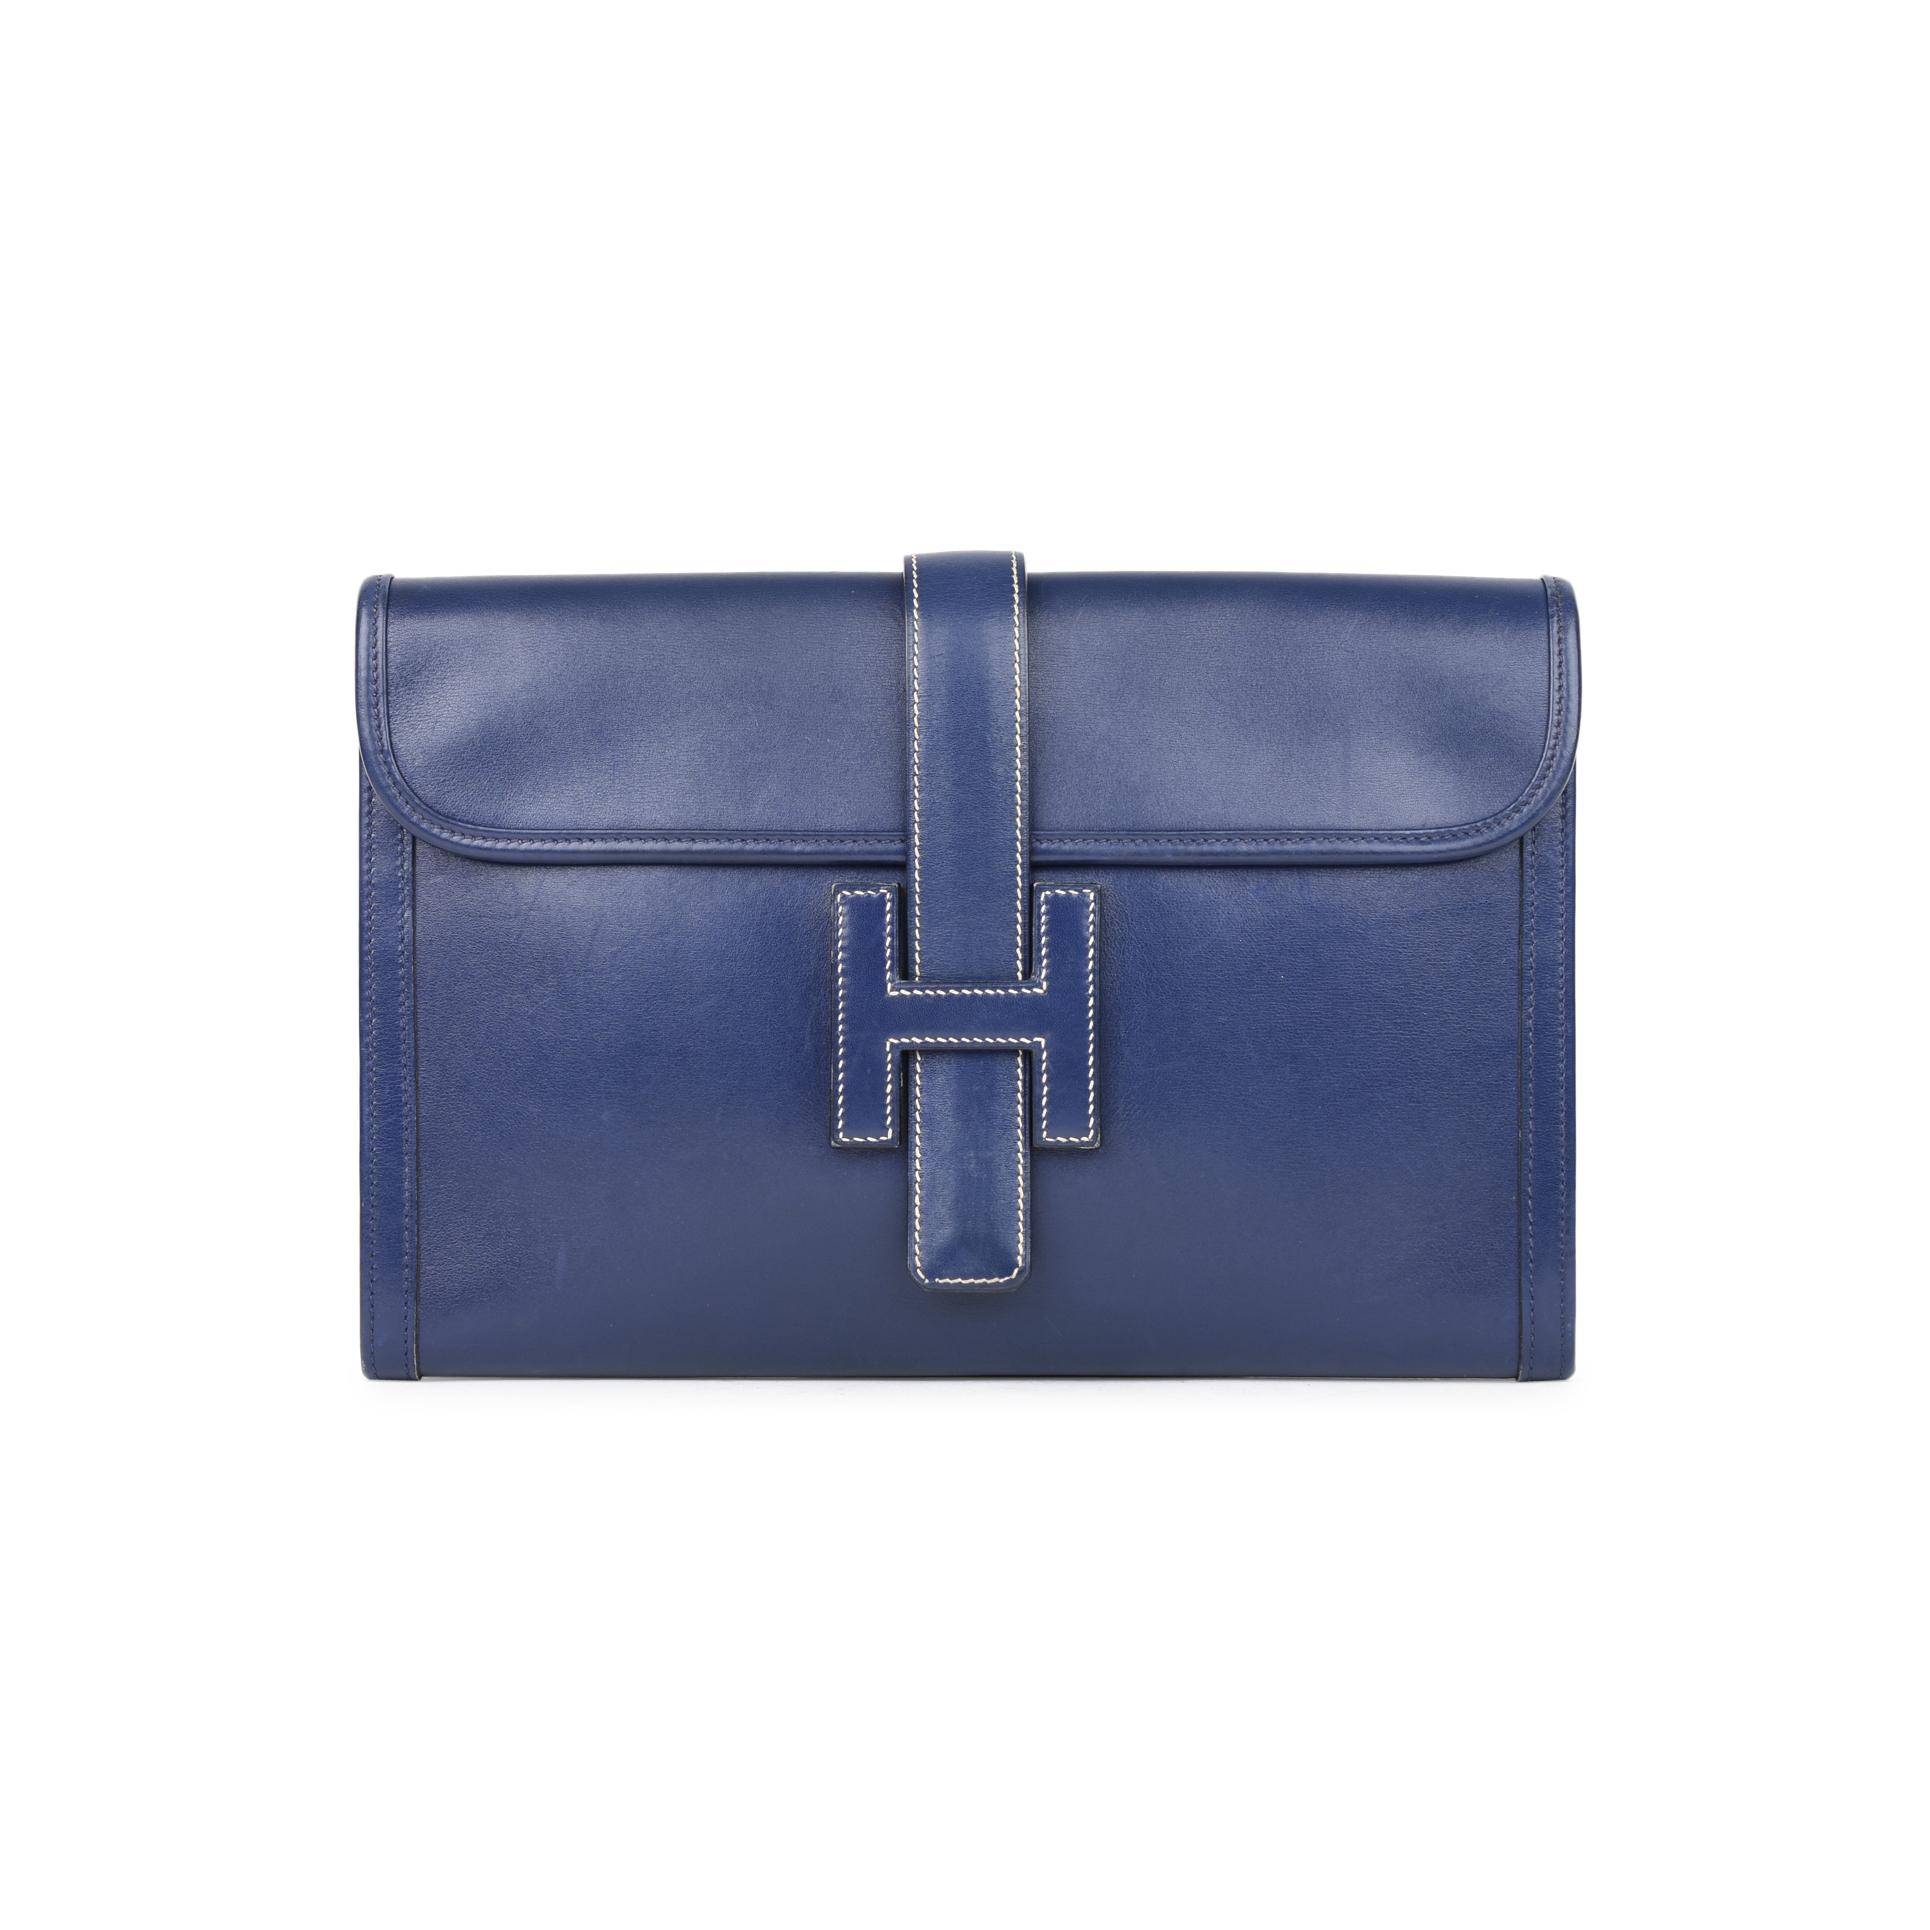 b243c67eb2c9 Authentic Vintage Hermès Box Jige Clutch (PSS-441-00034)